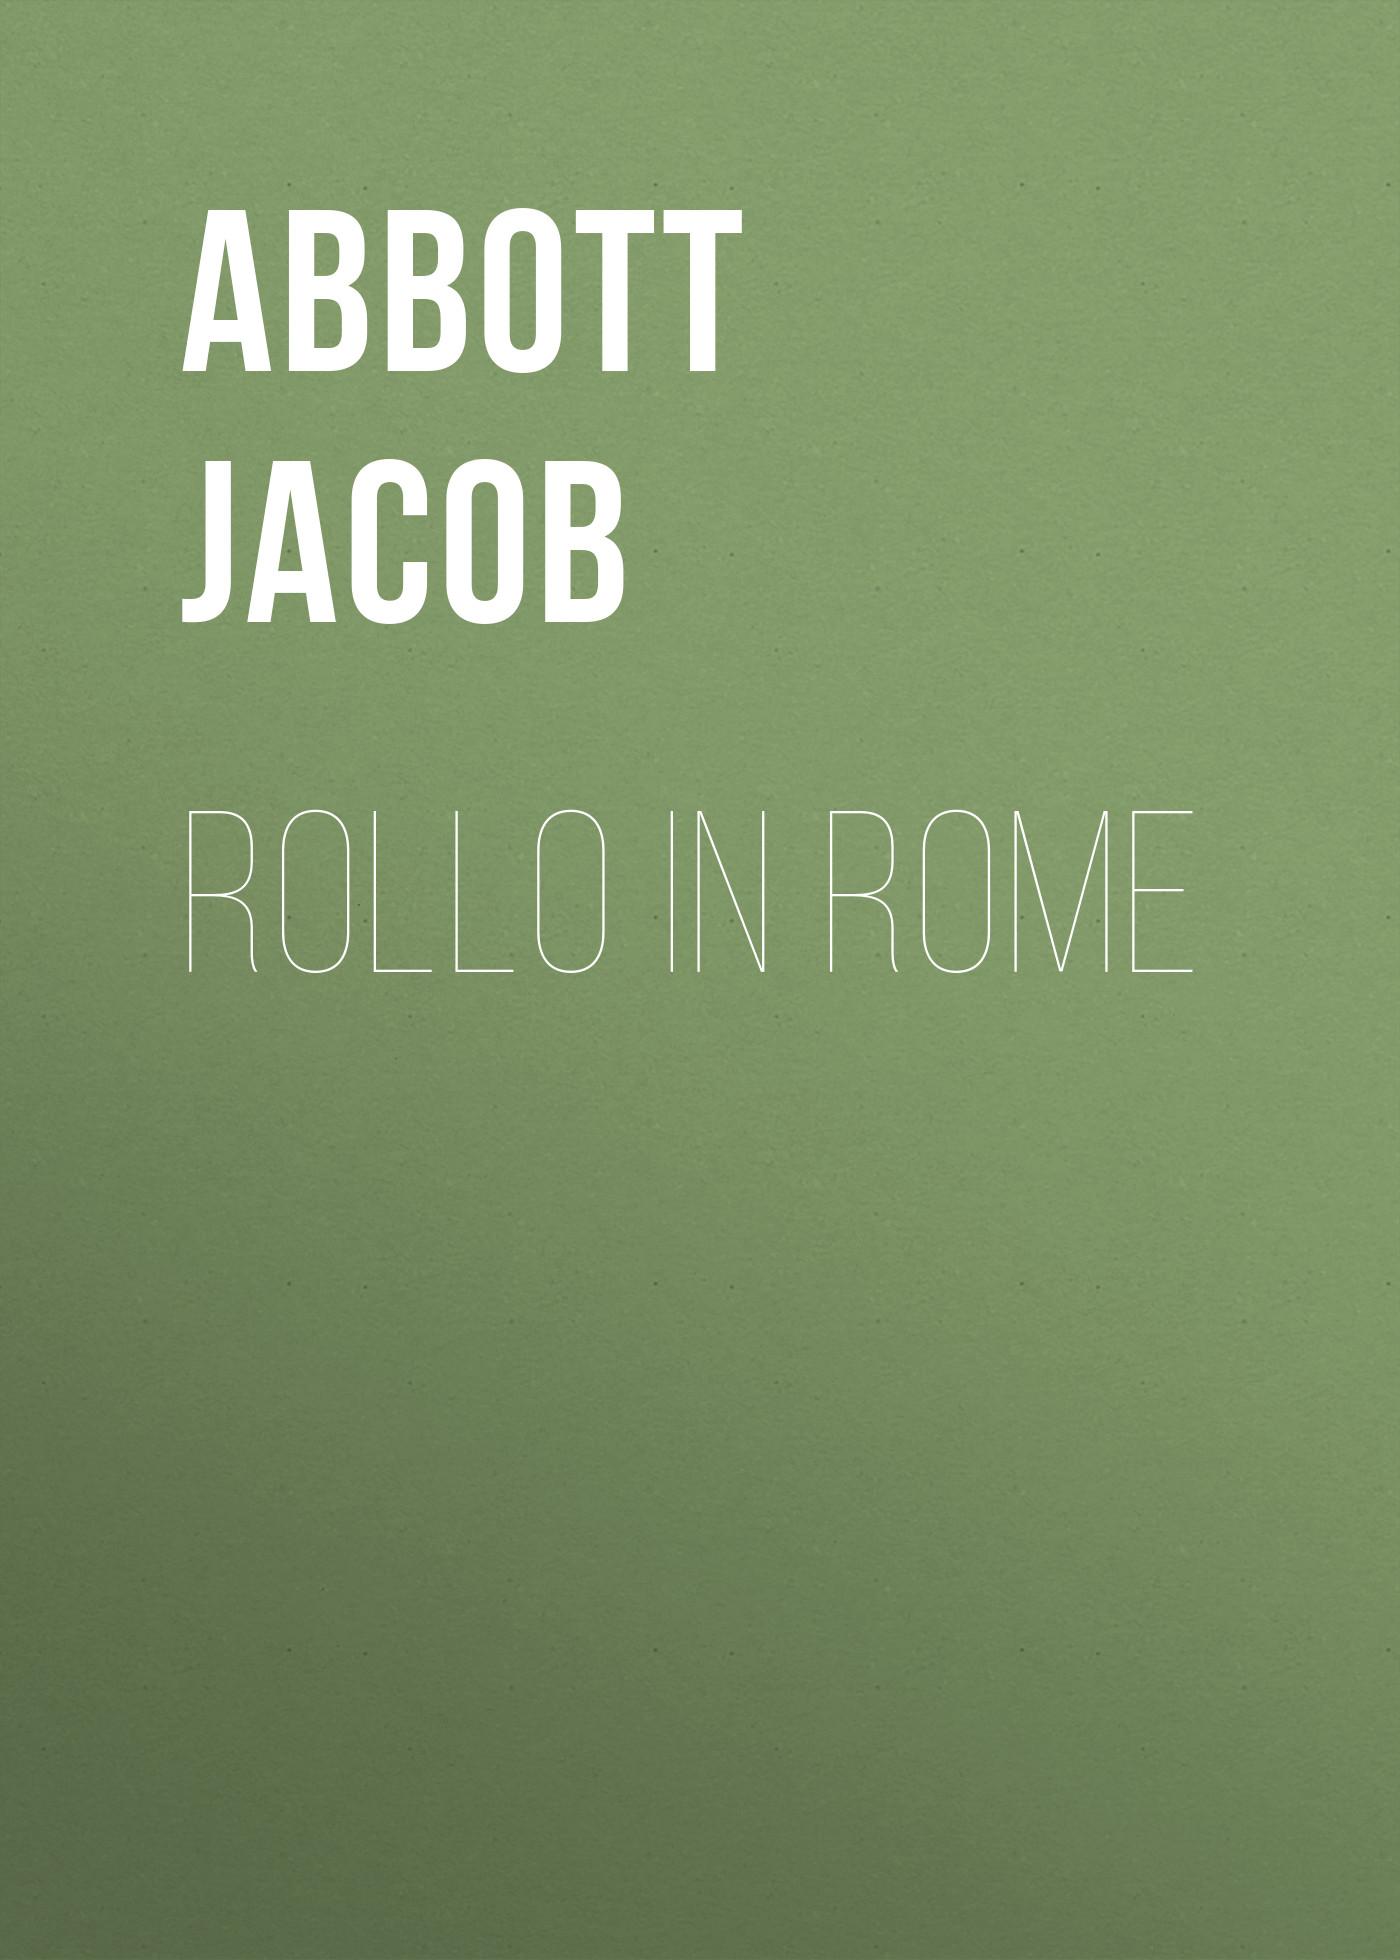 Abbott Jacob Rollo in Rome abbott jacob rollo on the rhine